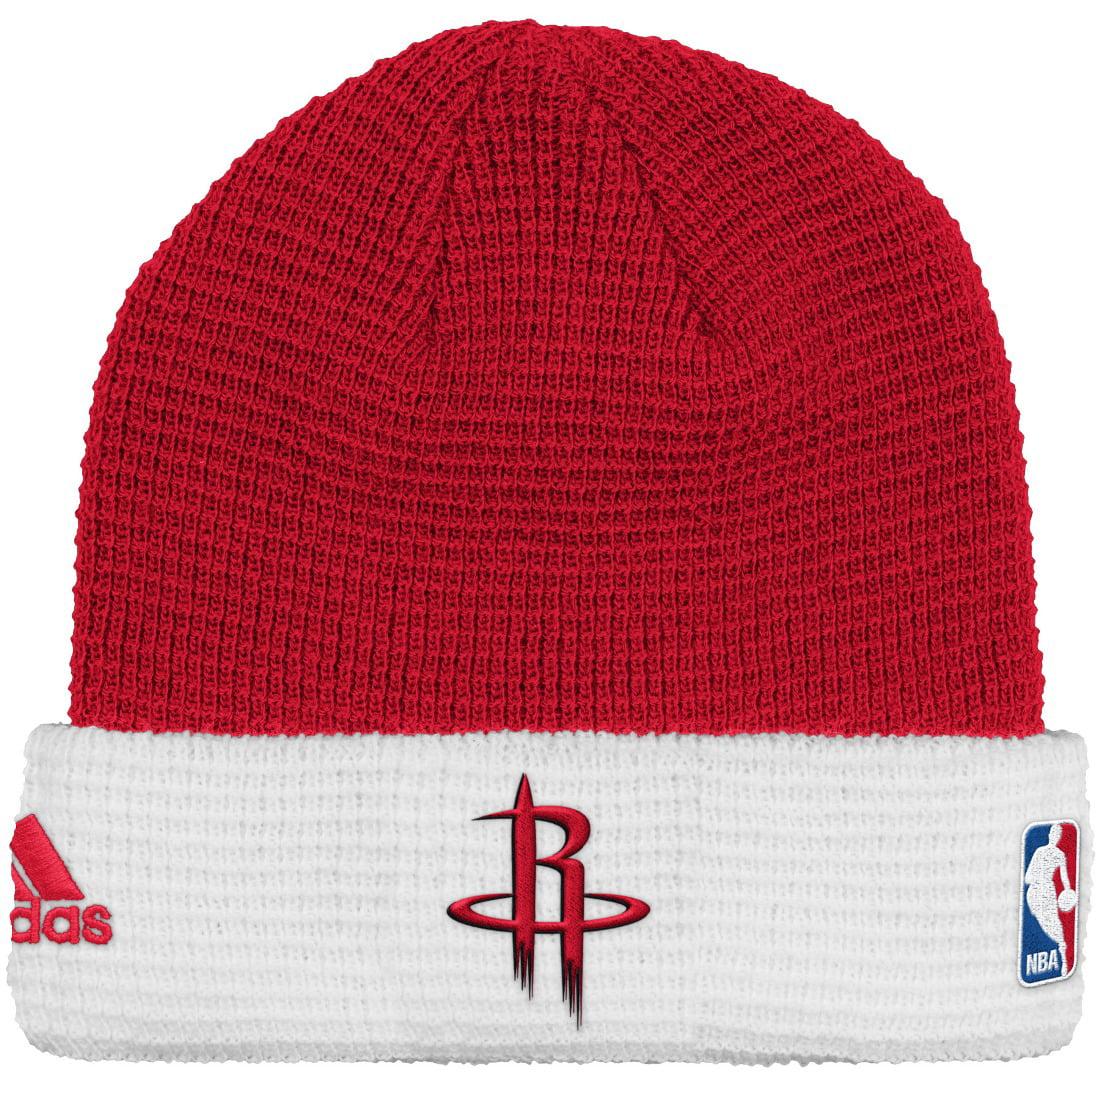 Houston Rockets Adidas NBA 2015 Authentic Team Cuffed Knit Hat by Adidas